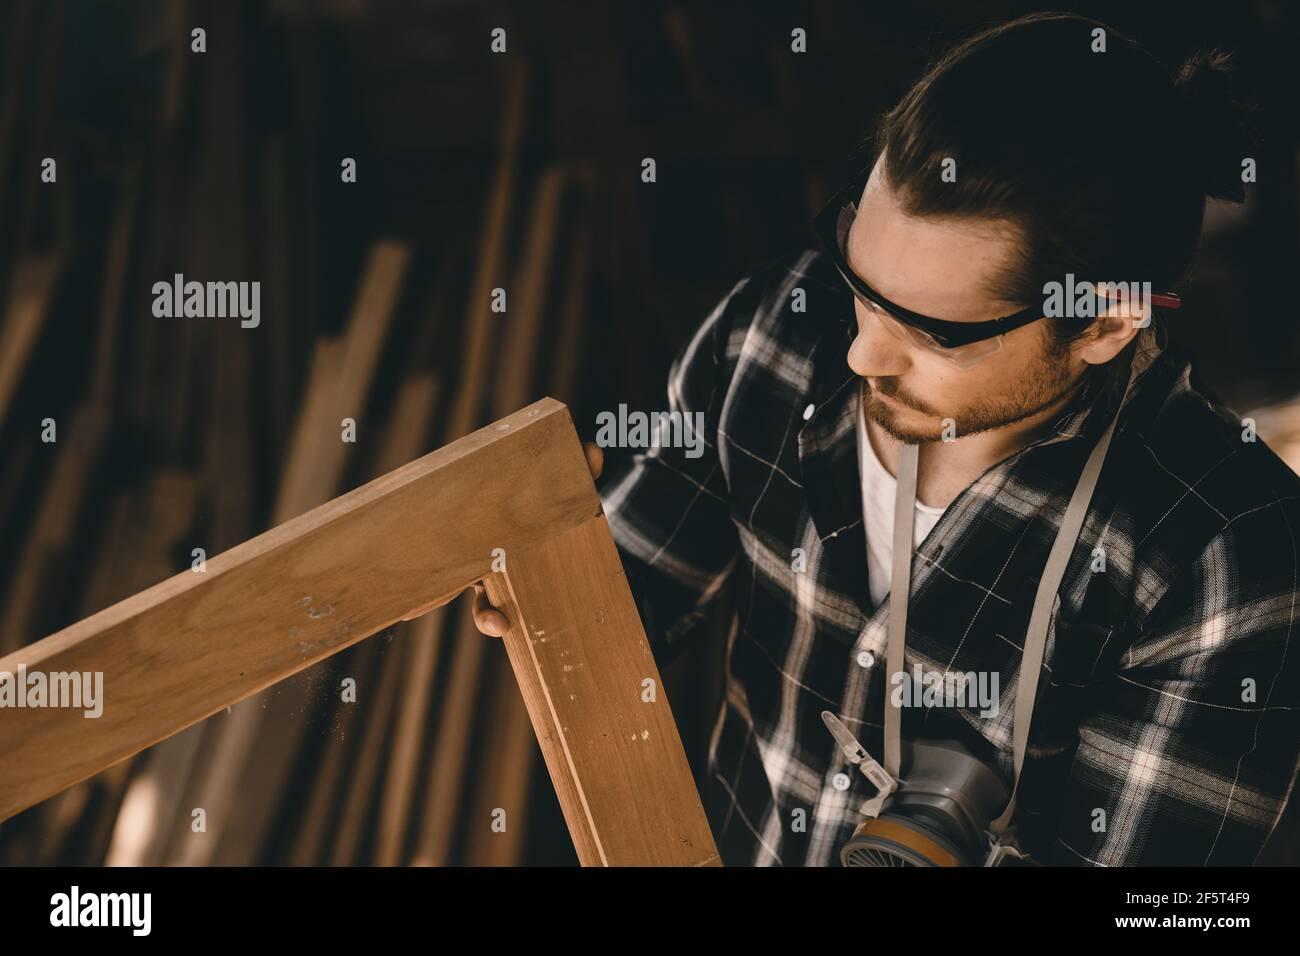 Carpenter man professional skilled in wood work looking detail of masterpiece woodcraft in furniture workshop Stock Photo